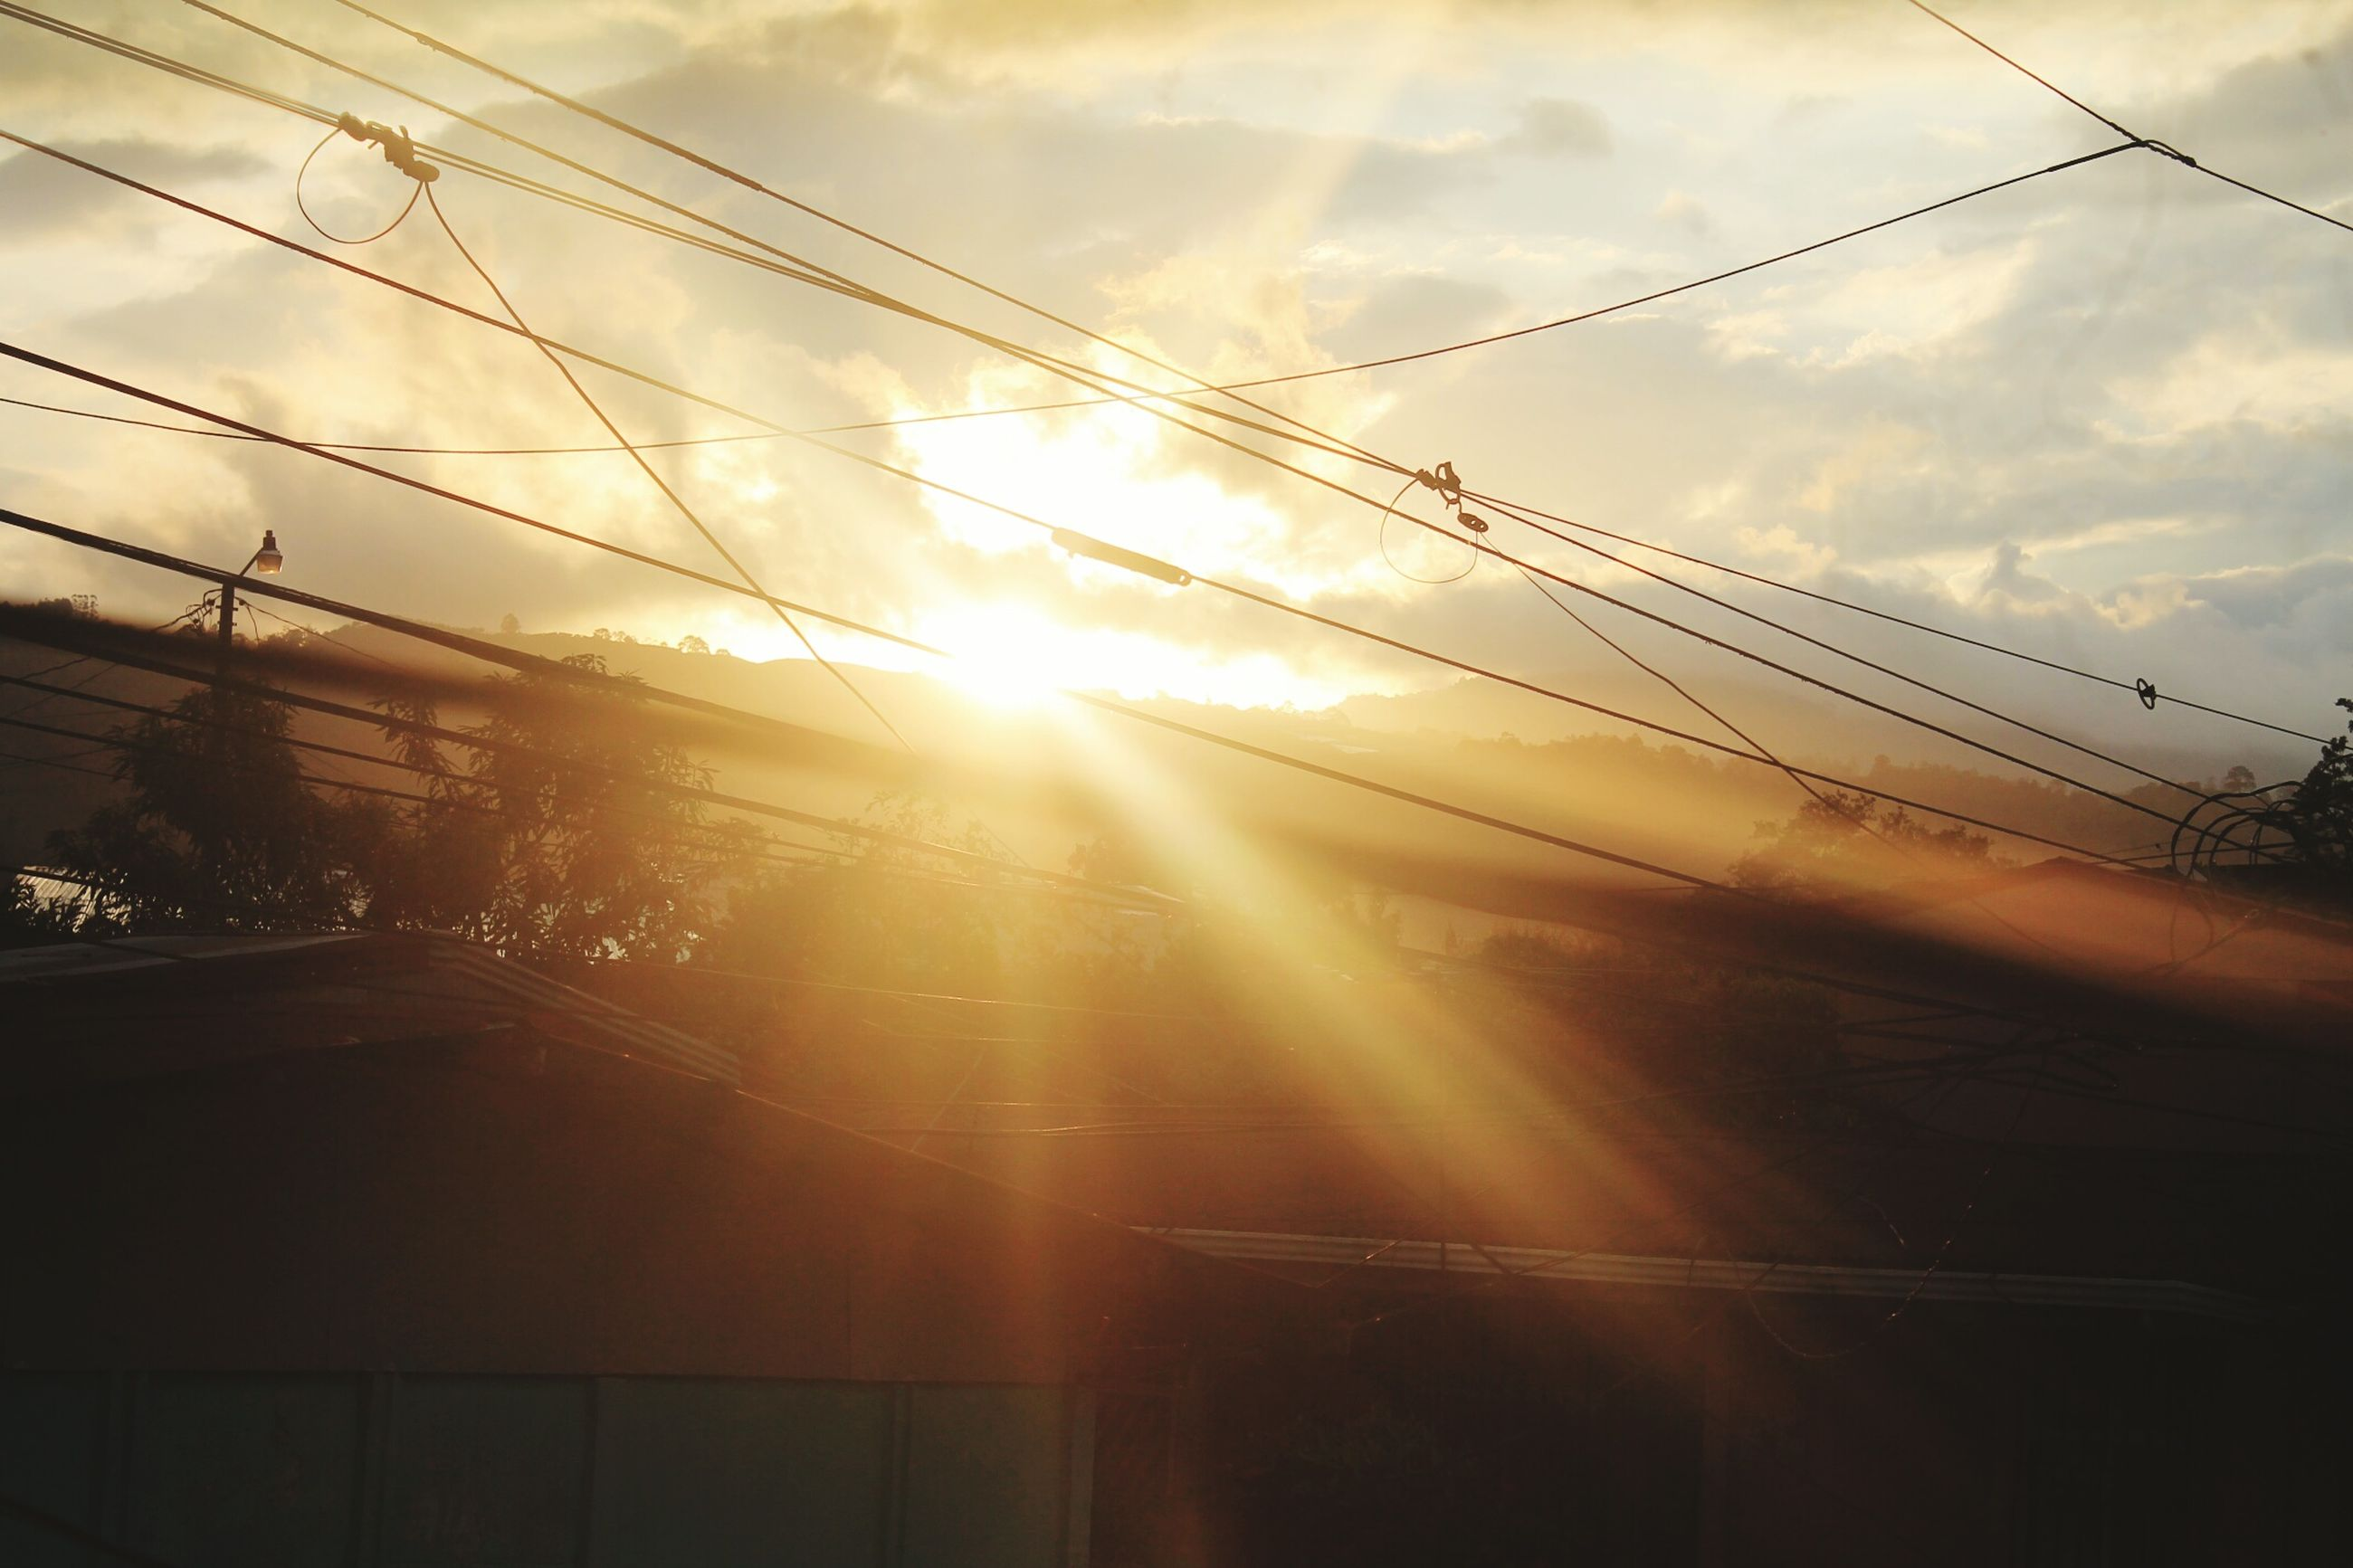 sun, sky, sunbeam, lens flare, sunlight, power line, sunset, transportation, built structure, electricity pylon, cable, building exterior, cloud - sky, architecture, silhouette, car, mode of transport, cloud, street, outdoors